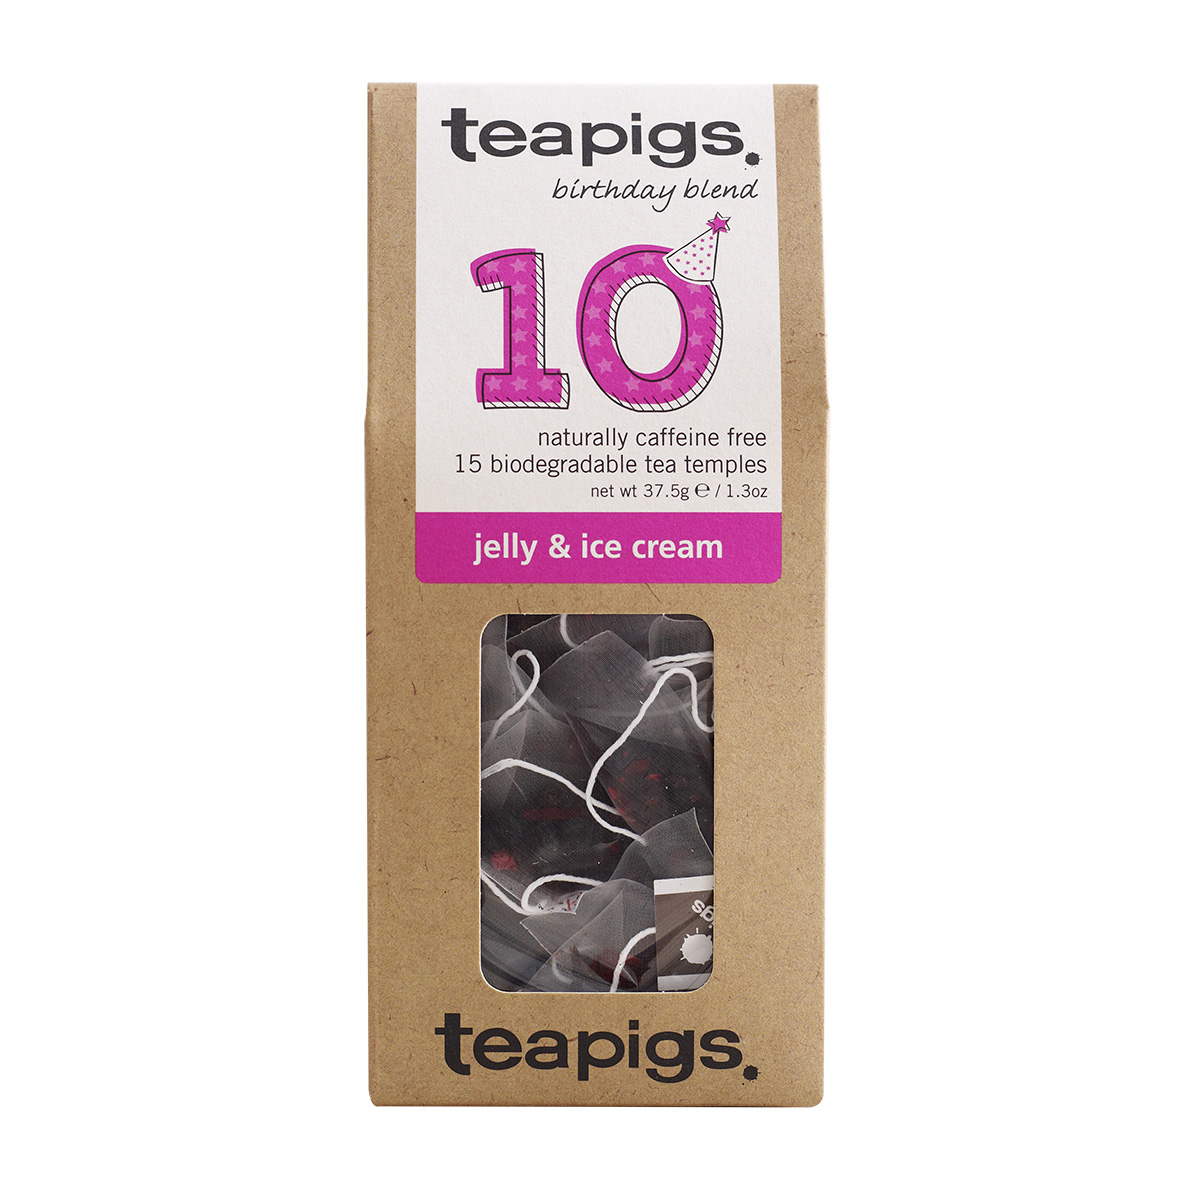 Infusion gelée & glace, Teapigs (x 15 sachets)